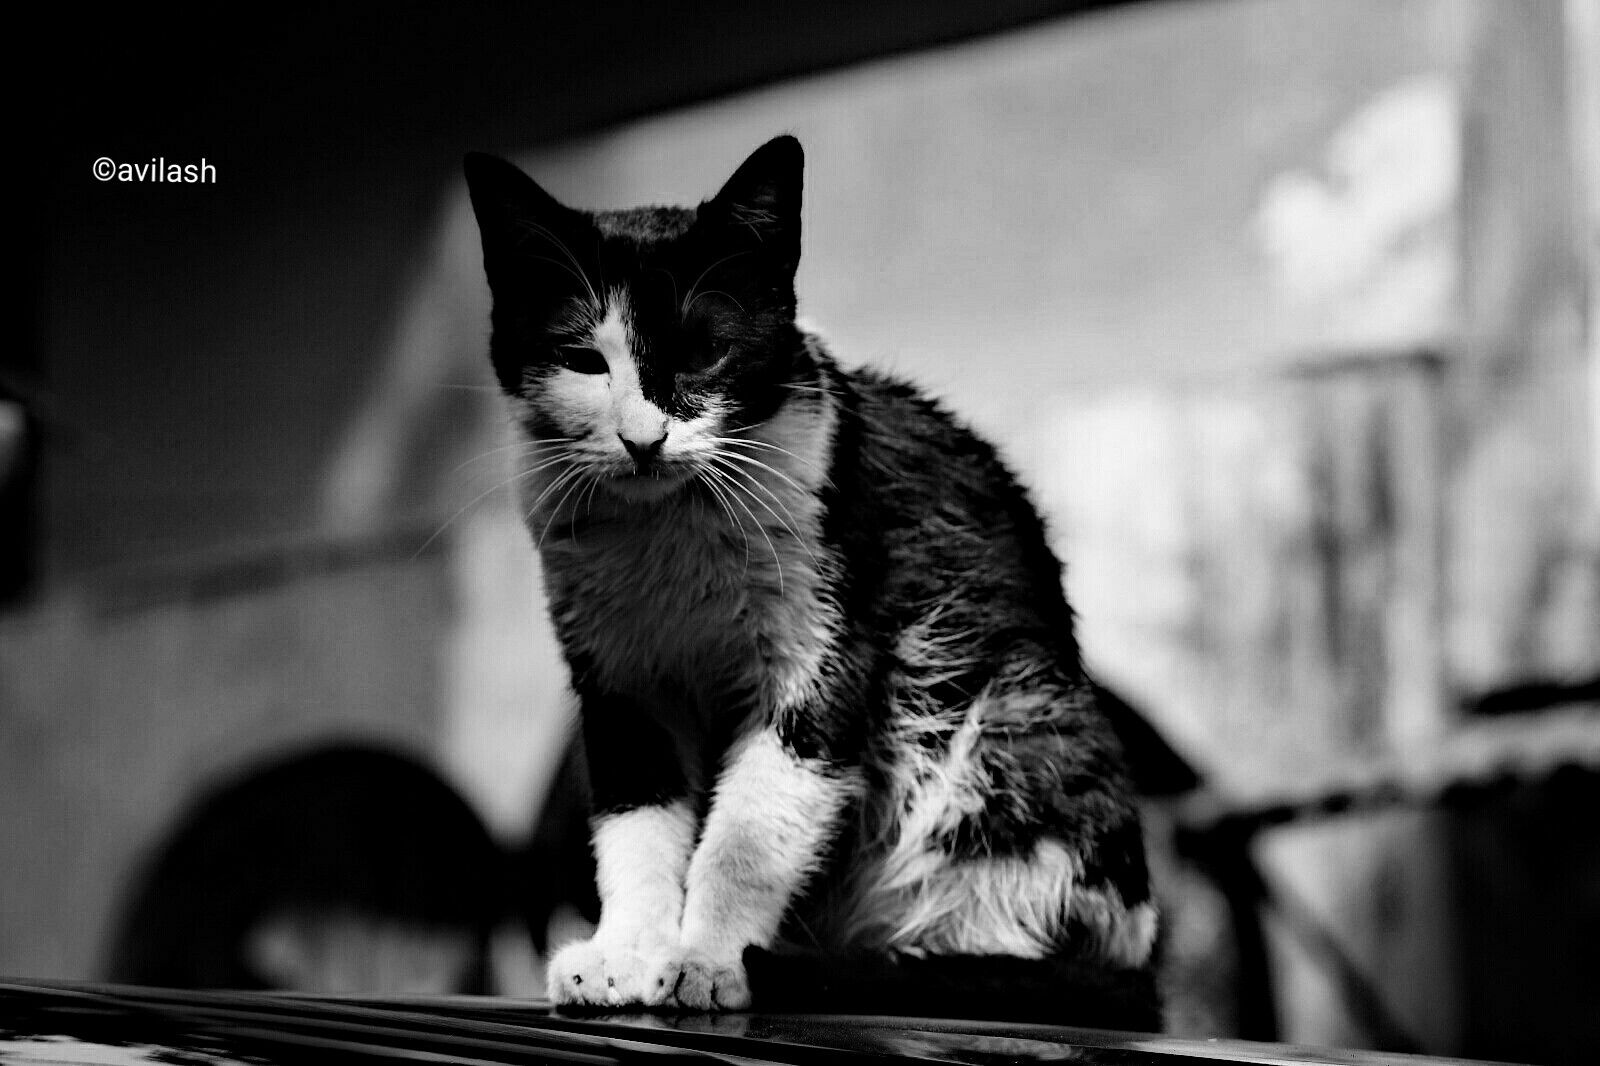 object : black cat camera : 1200D lens : 18-55mm edit : black and white